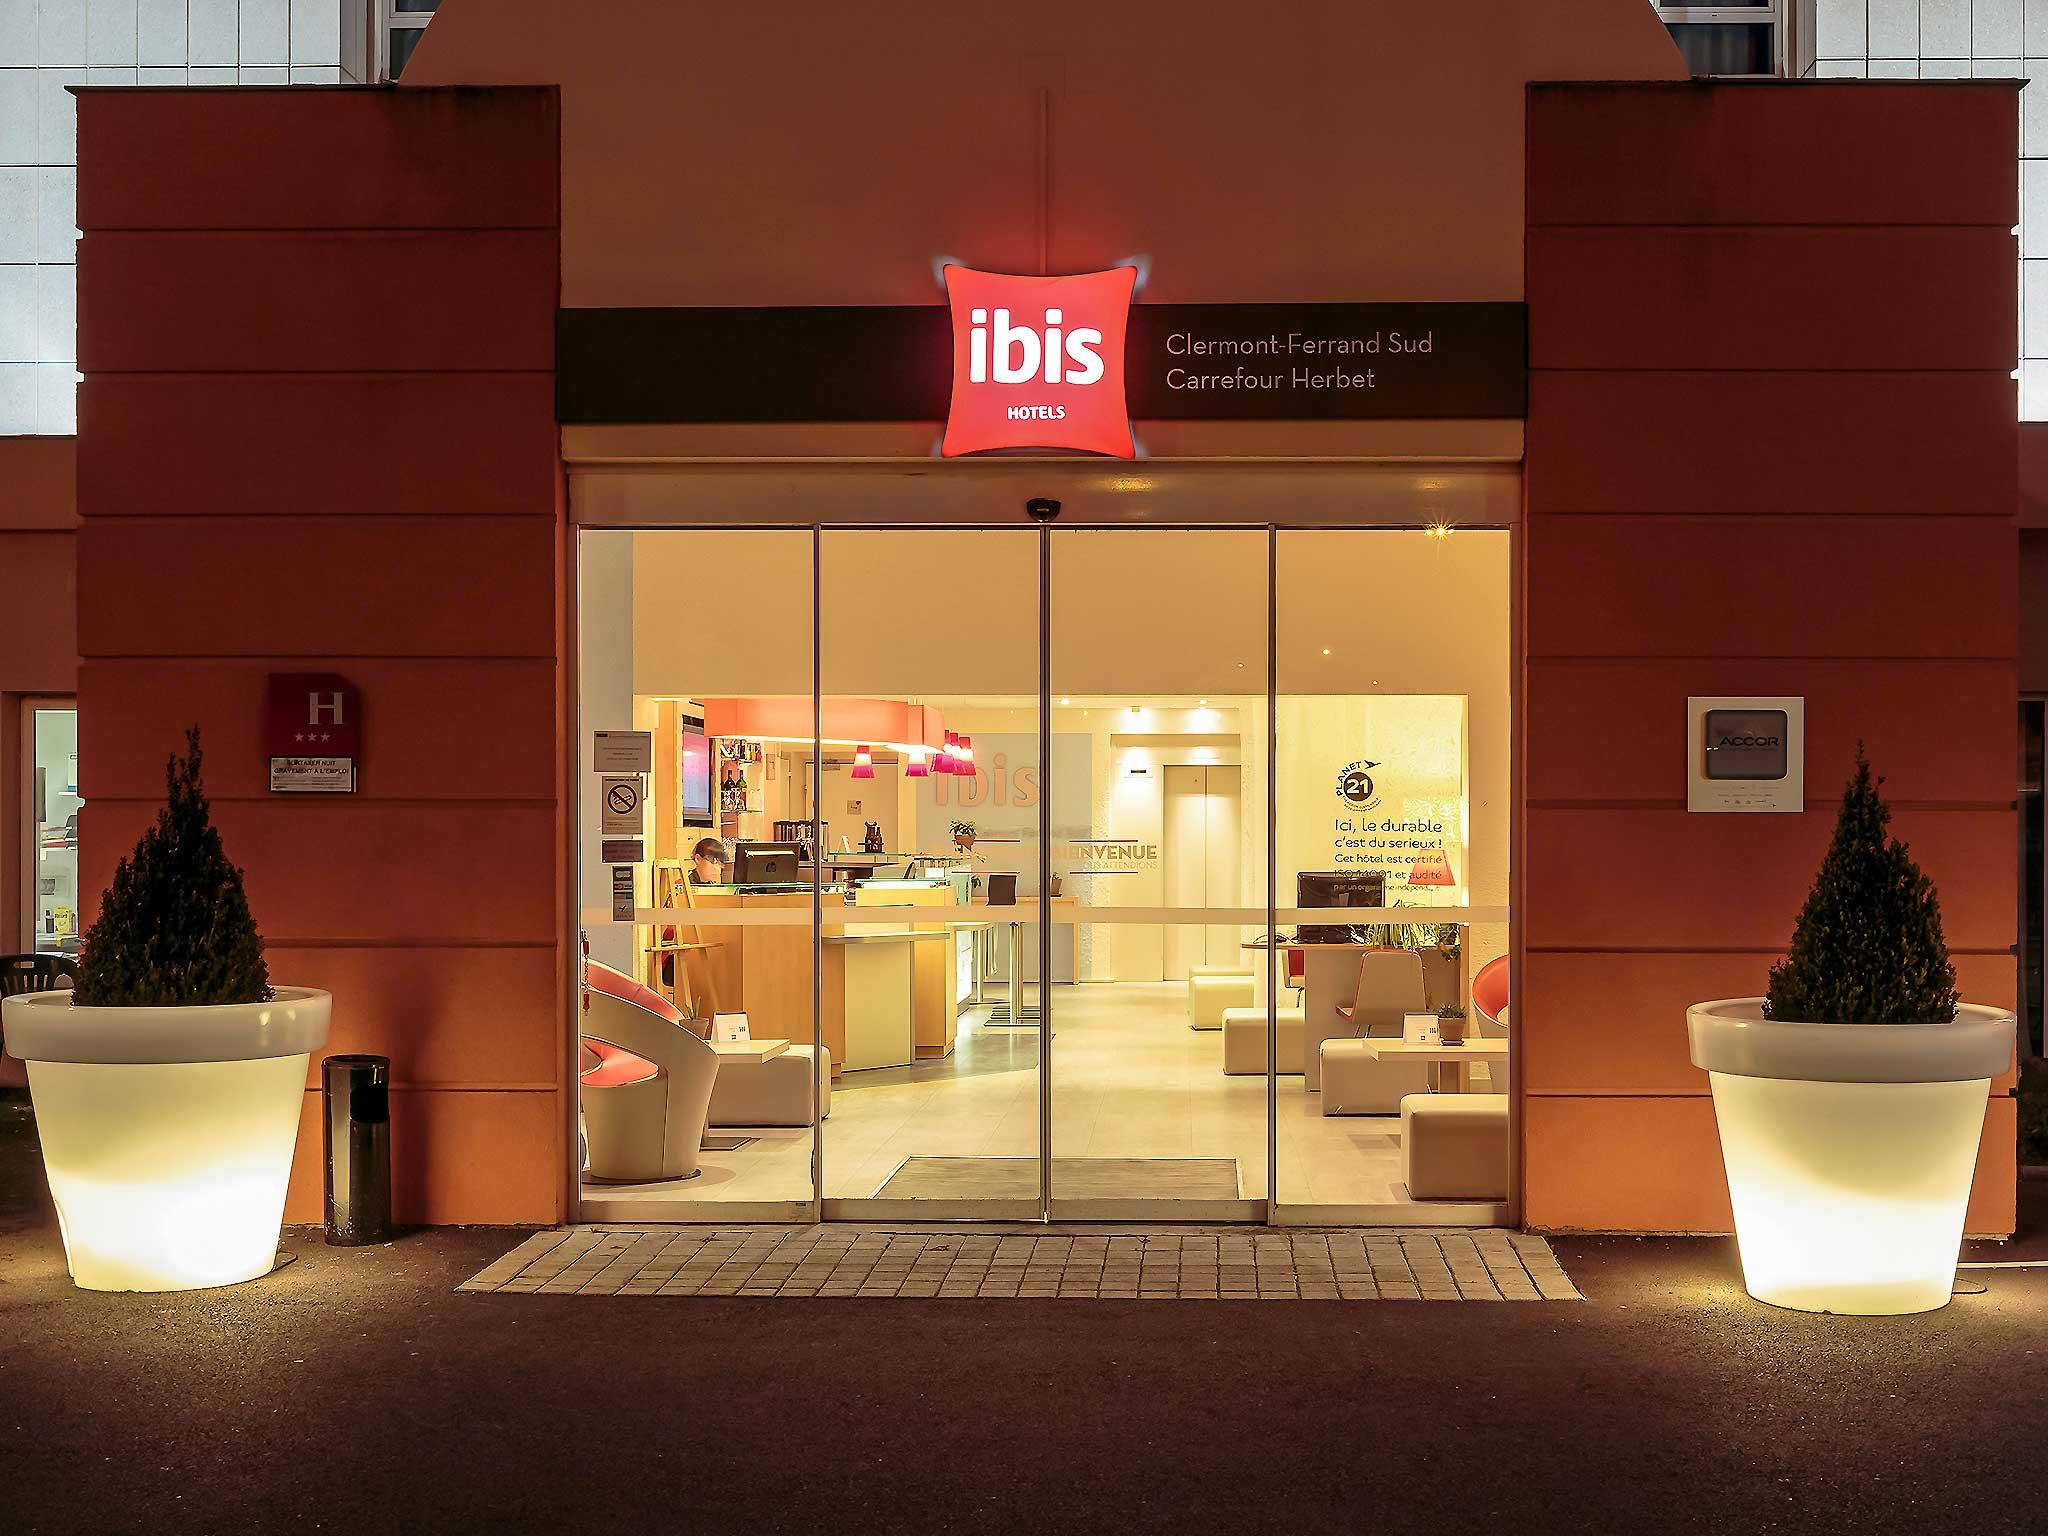 Hotel - ibis Clermont Ferrand Sud Carrefour Herbet